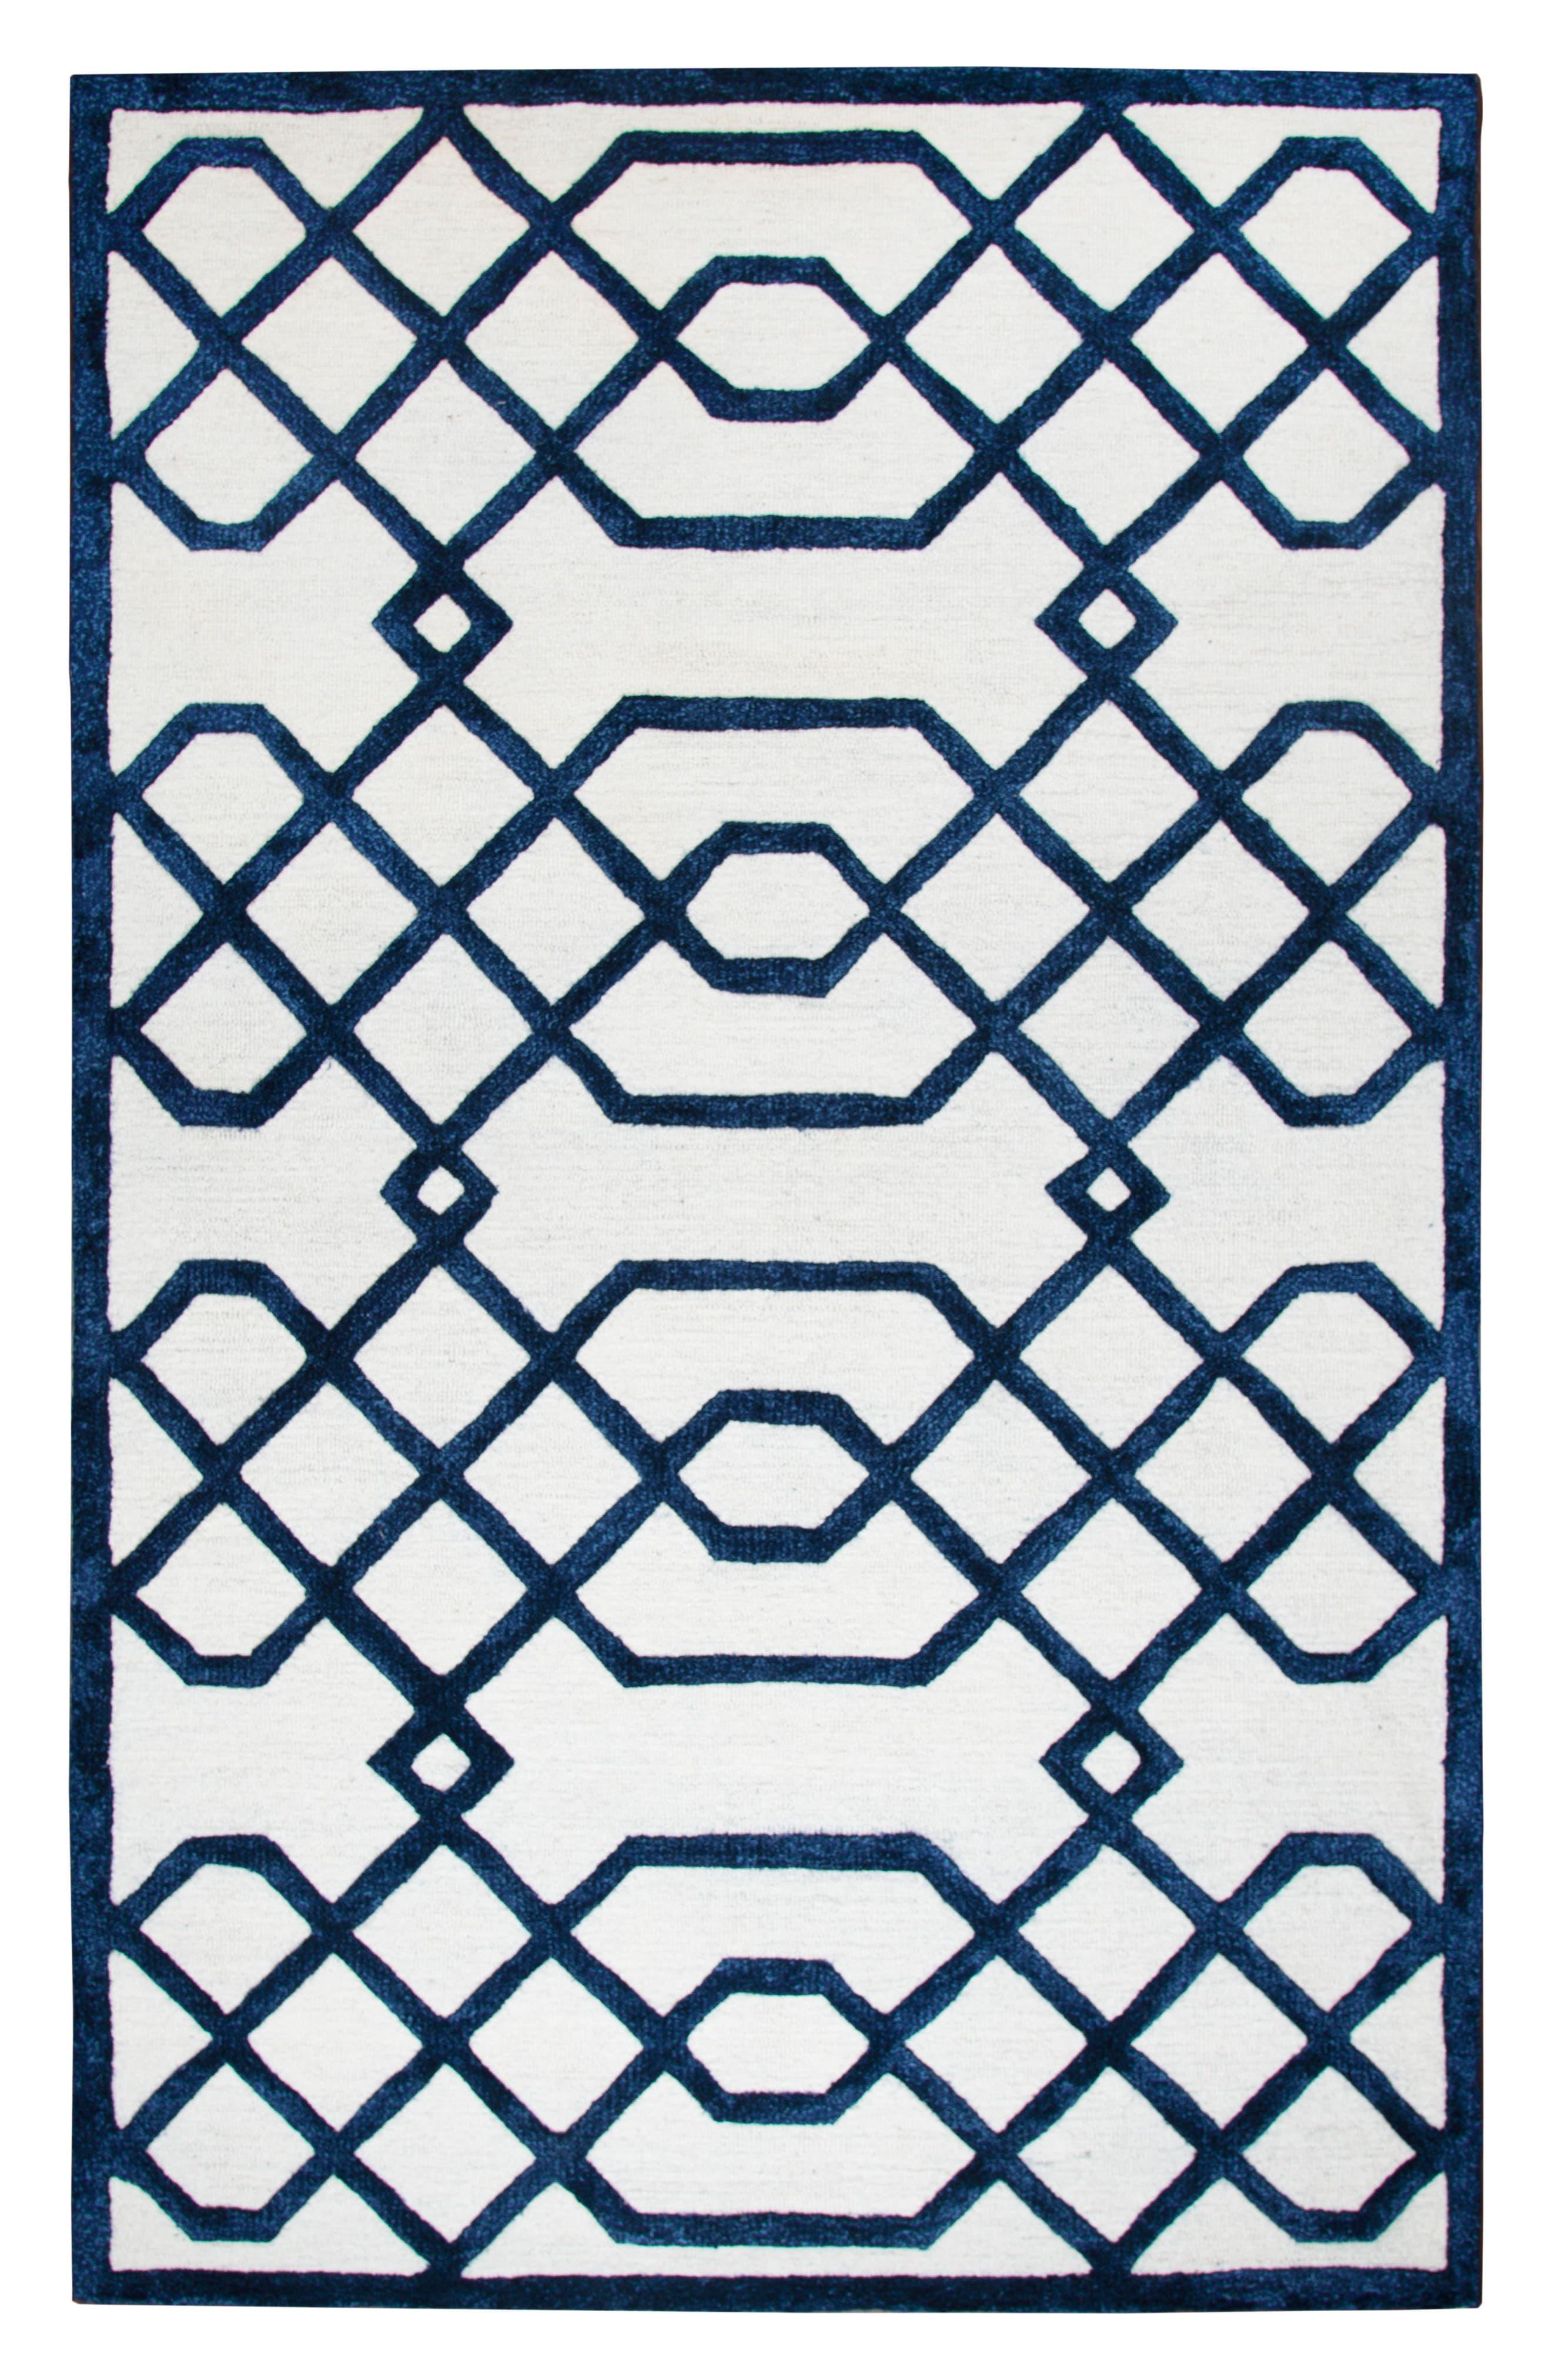 Lattice Scroll Hand Tufted Wool Area Rug,                         Main,                         color, Blue/ White